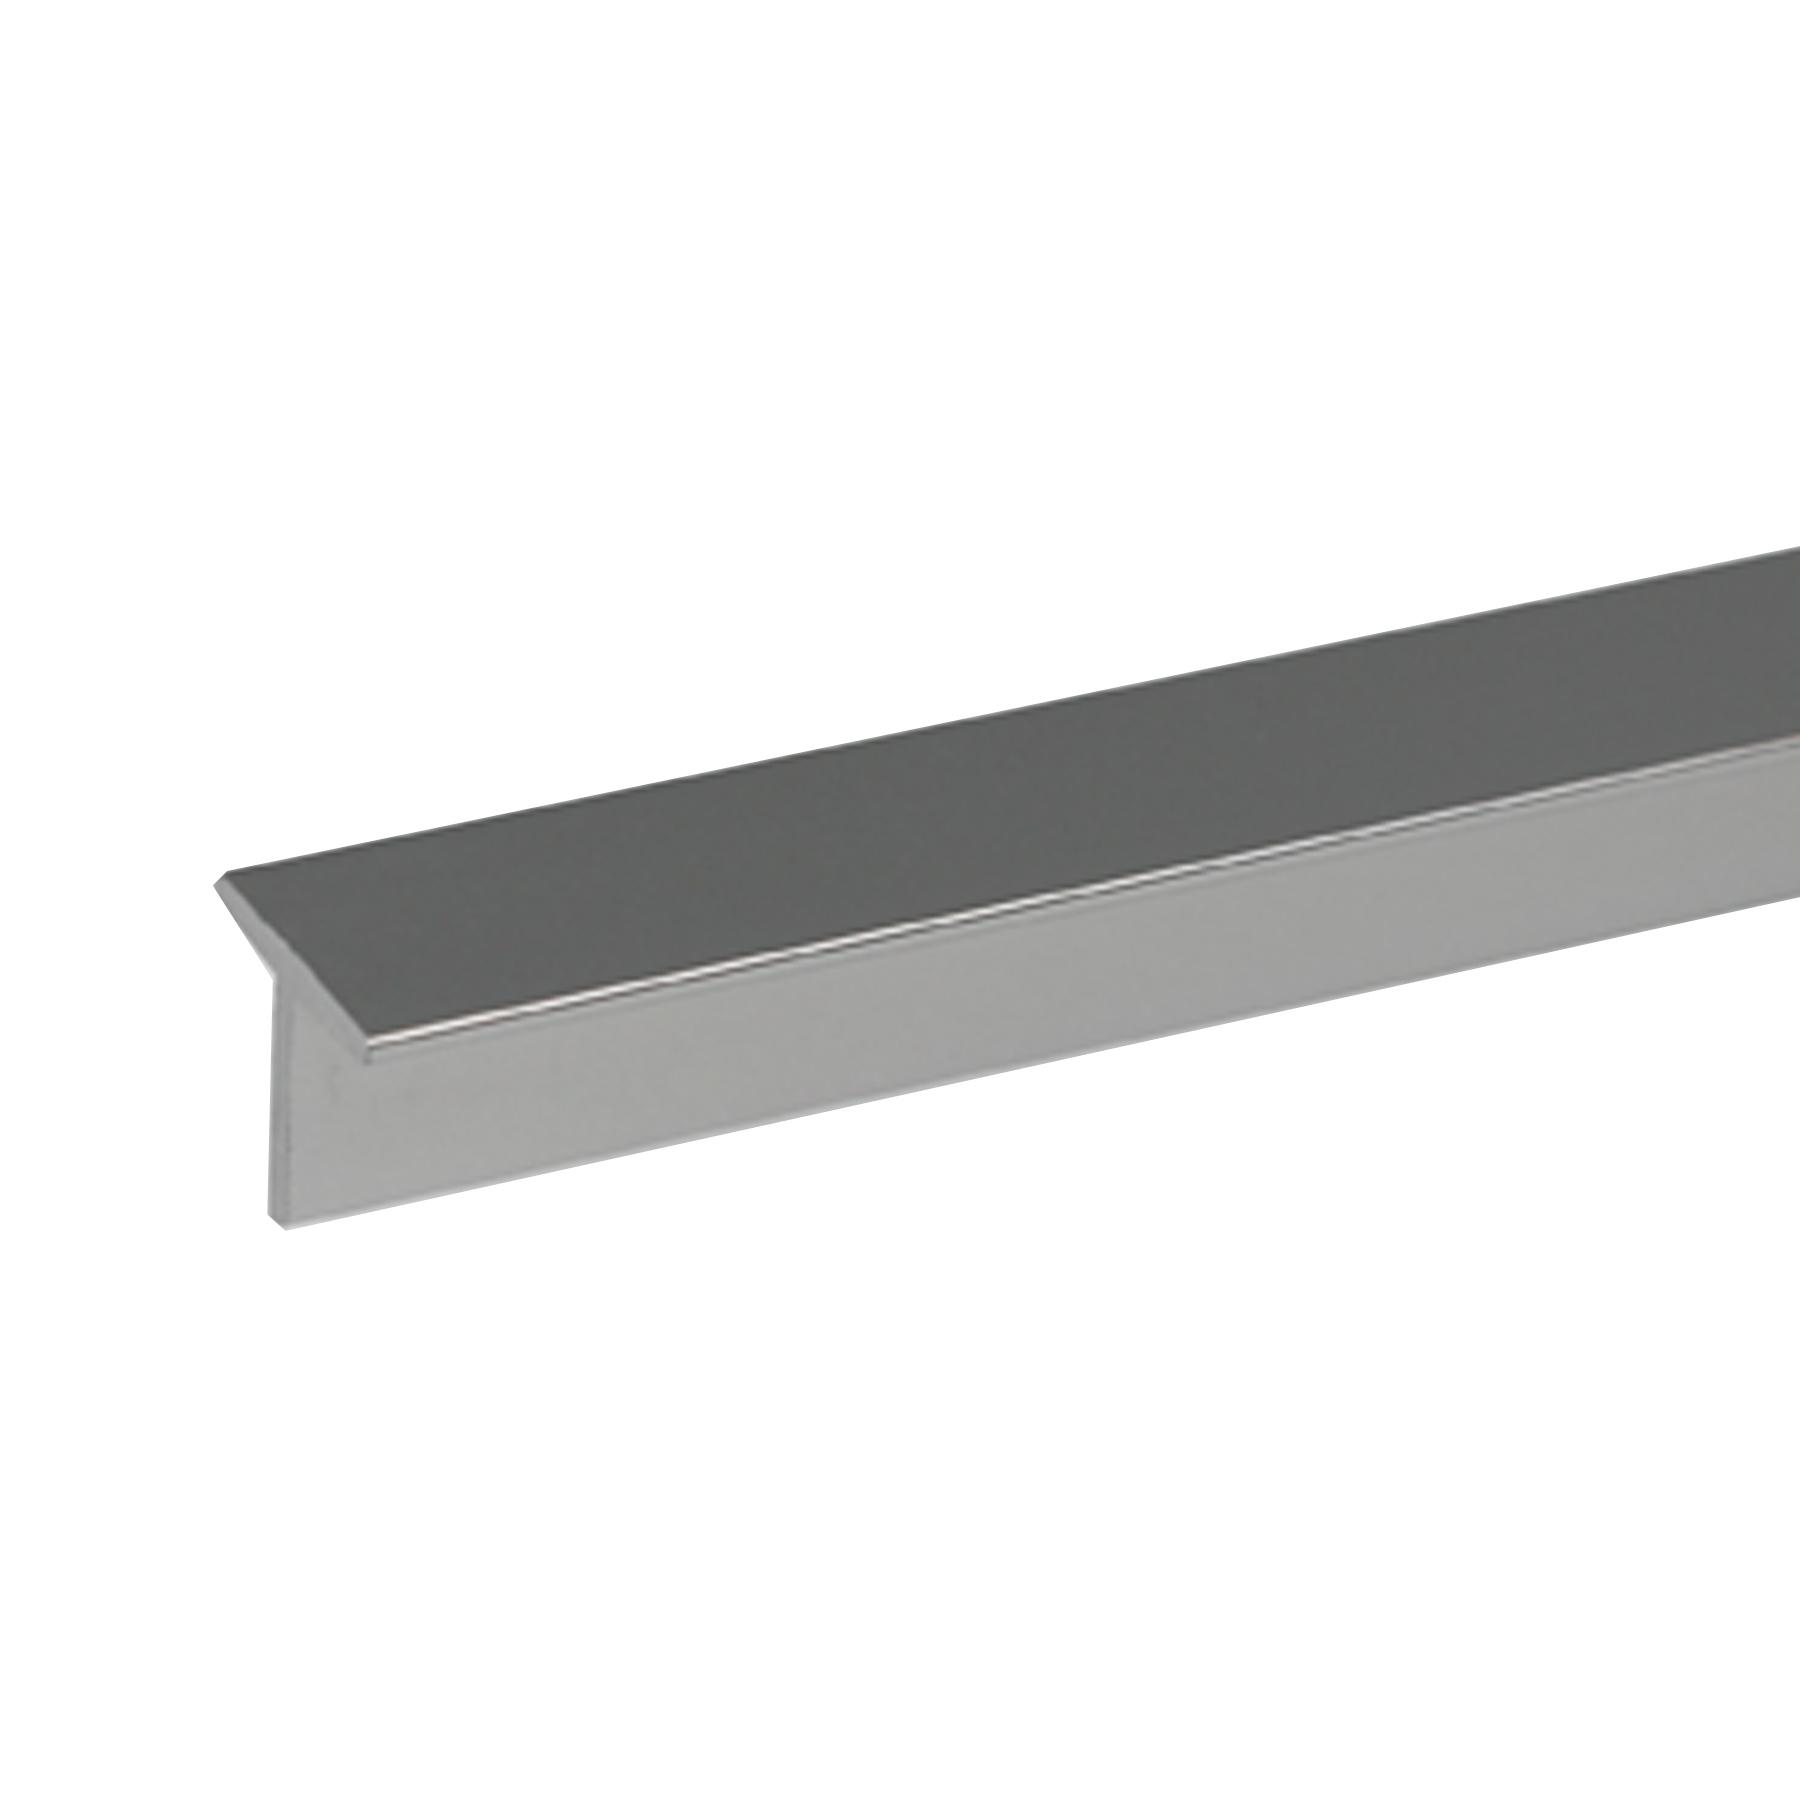 Perfil alum nio t 2mx15x1 5mm brilhante leroy merlin for Perfil u aluminio leroy merlin